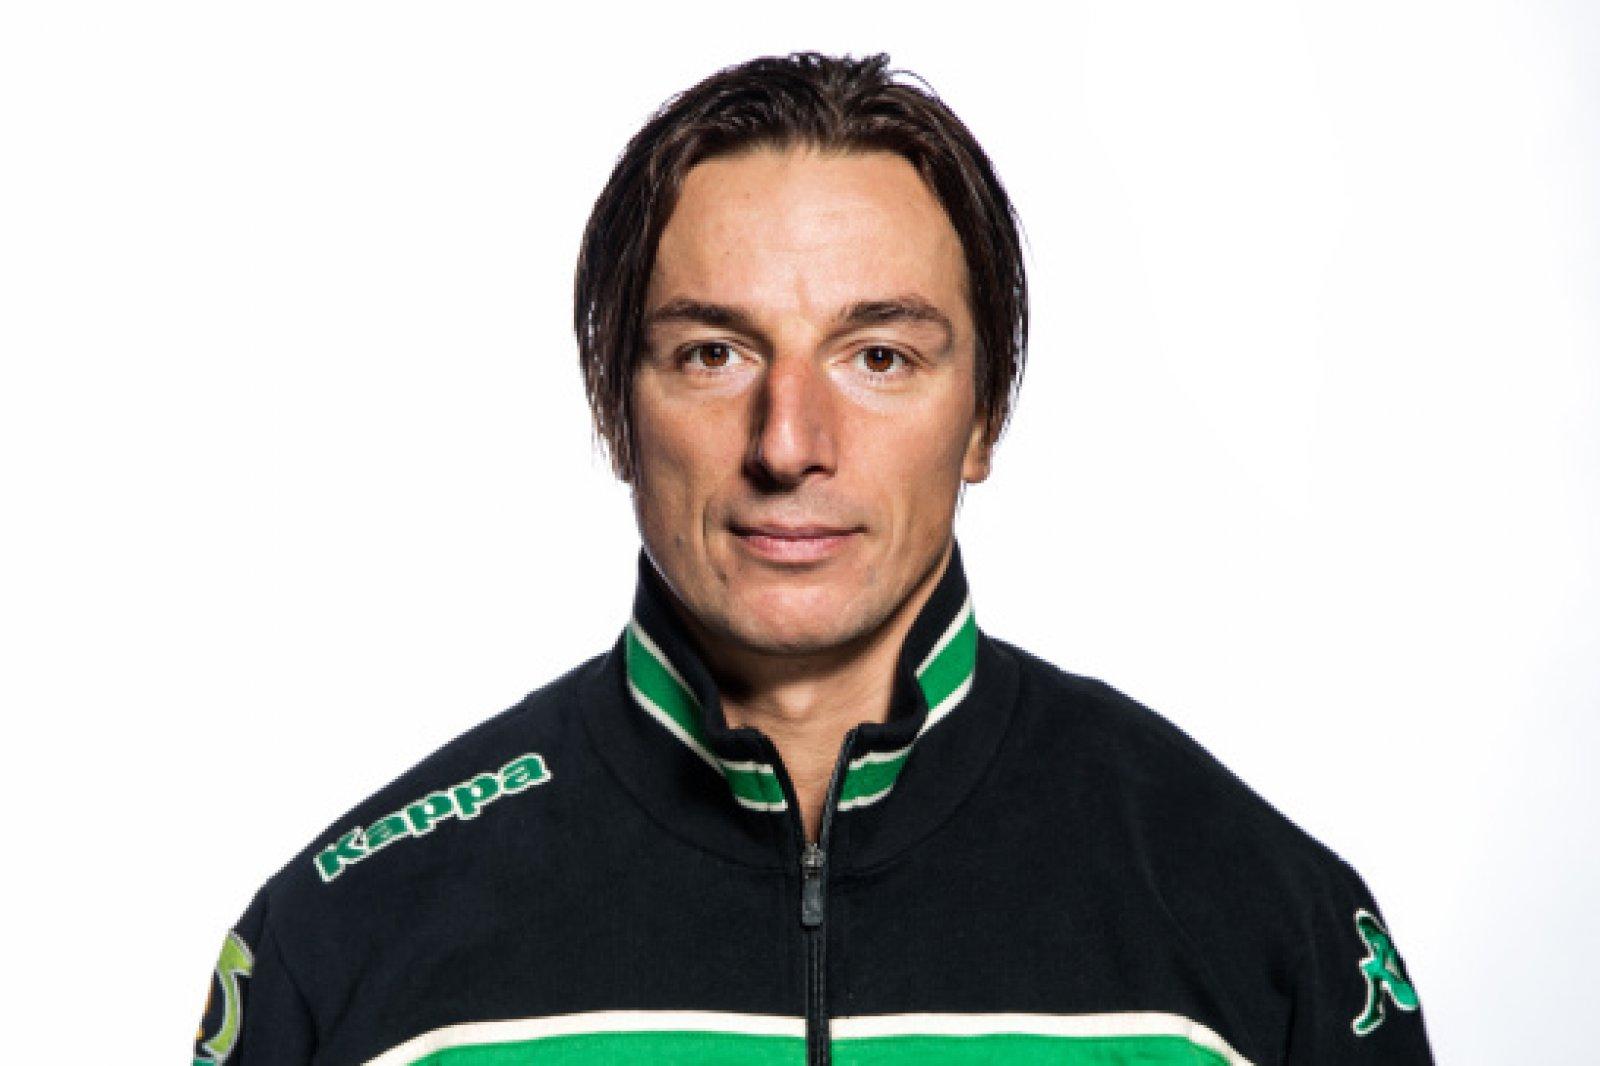 Václav Benák